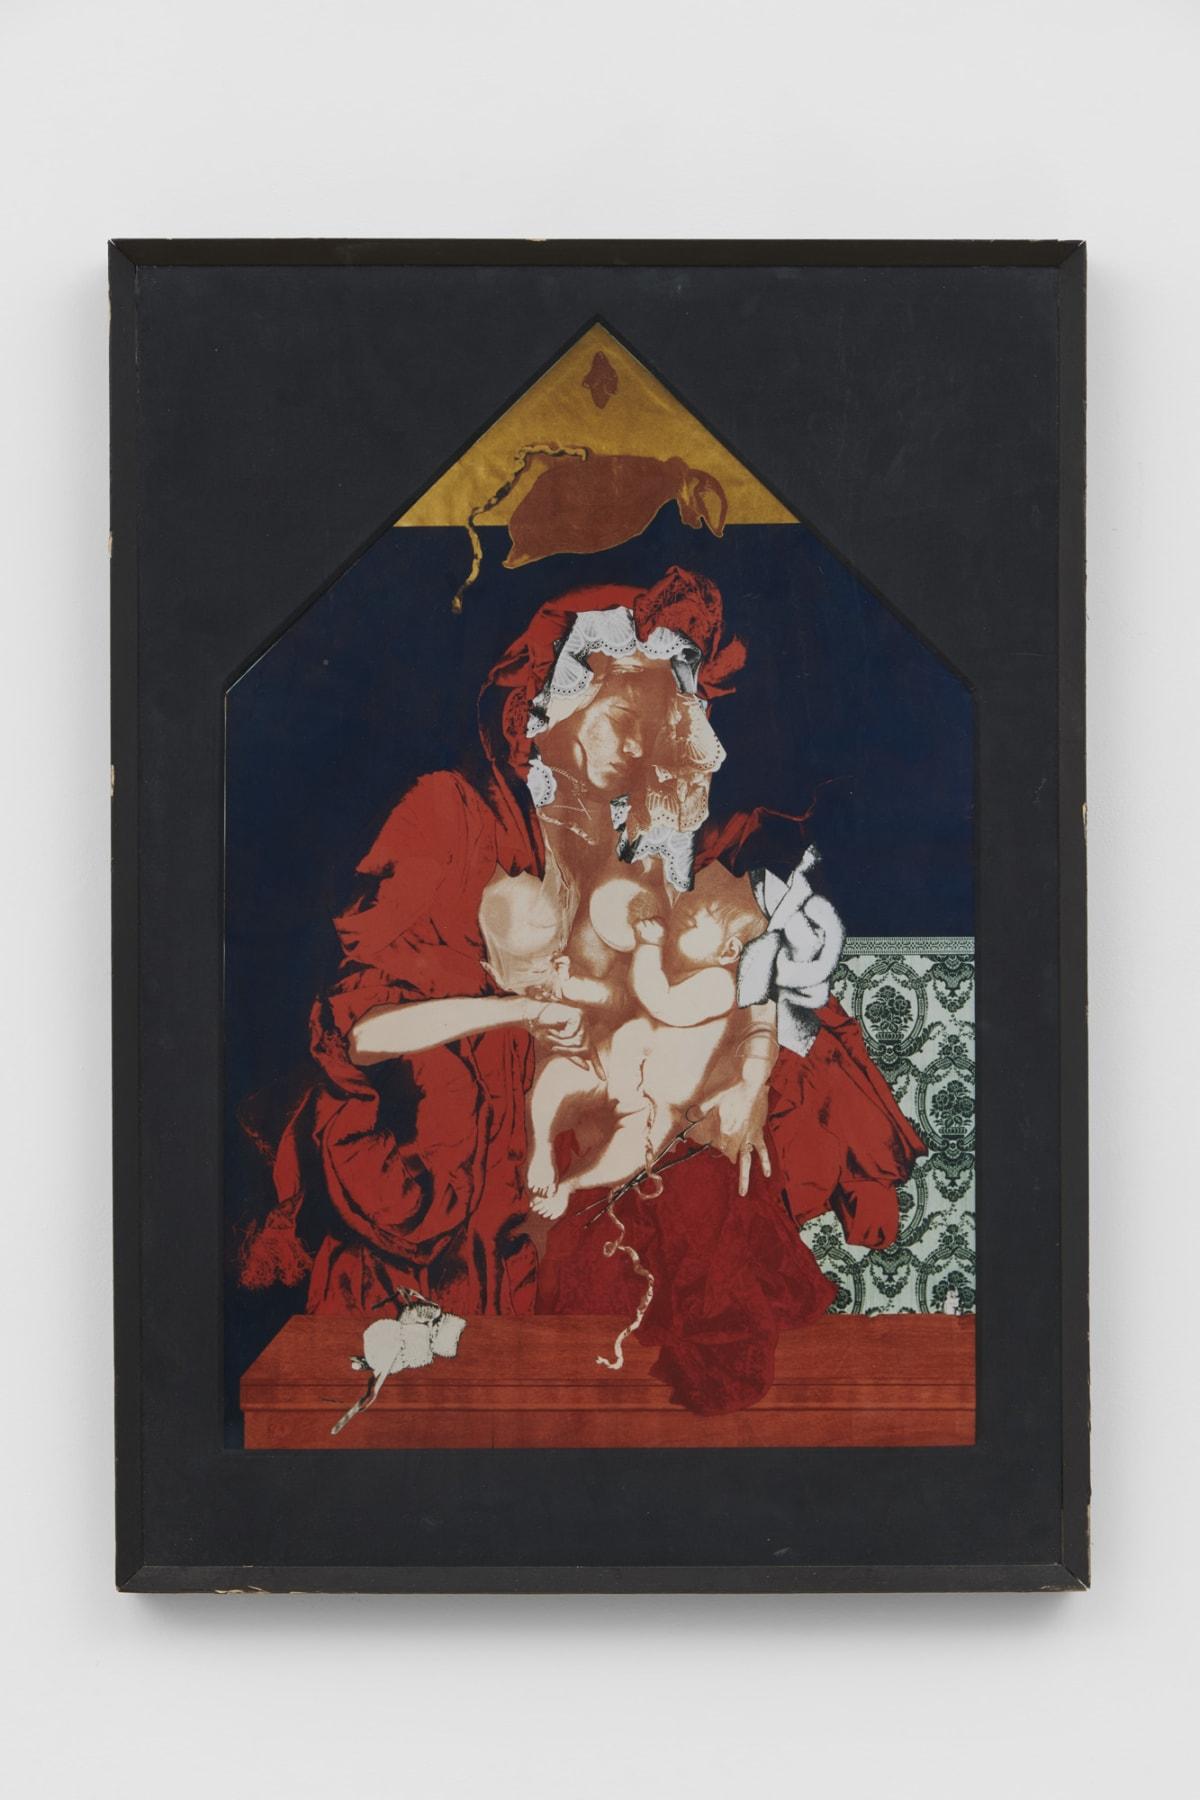 Helen CHADWICK One Flesh, 2002 screen print 60 x 37 cm Edition of 100